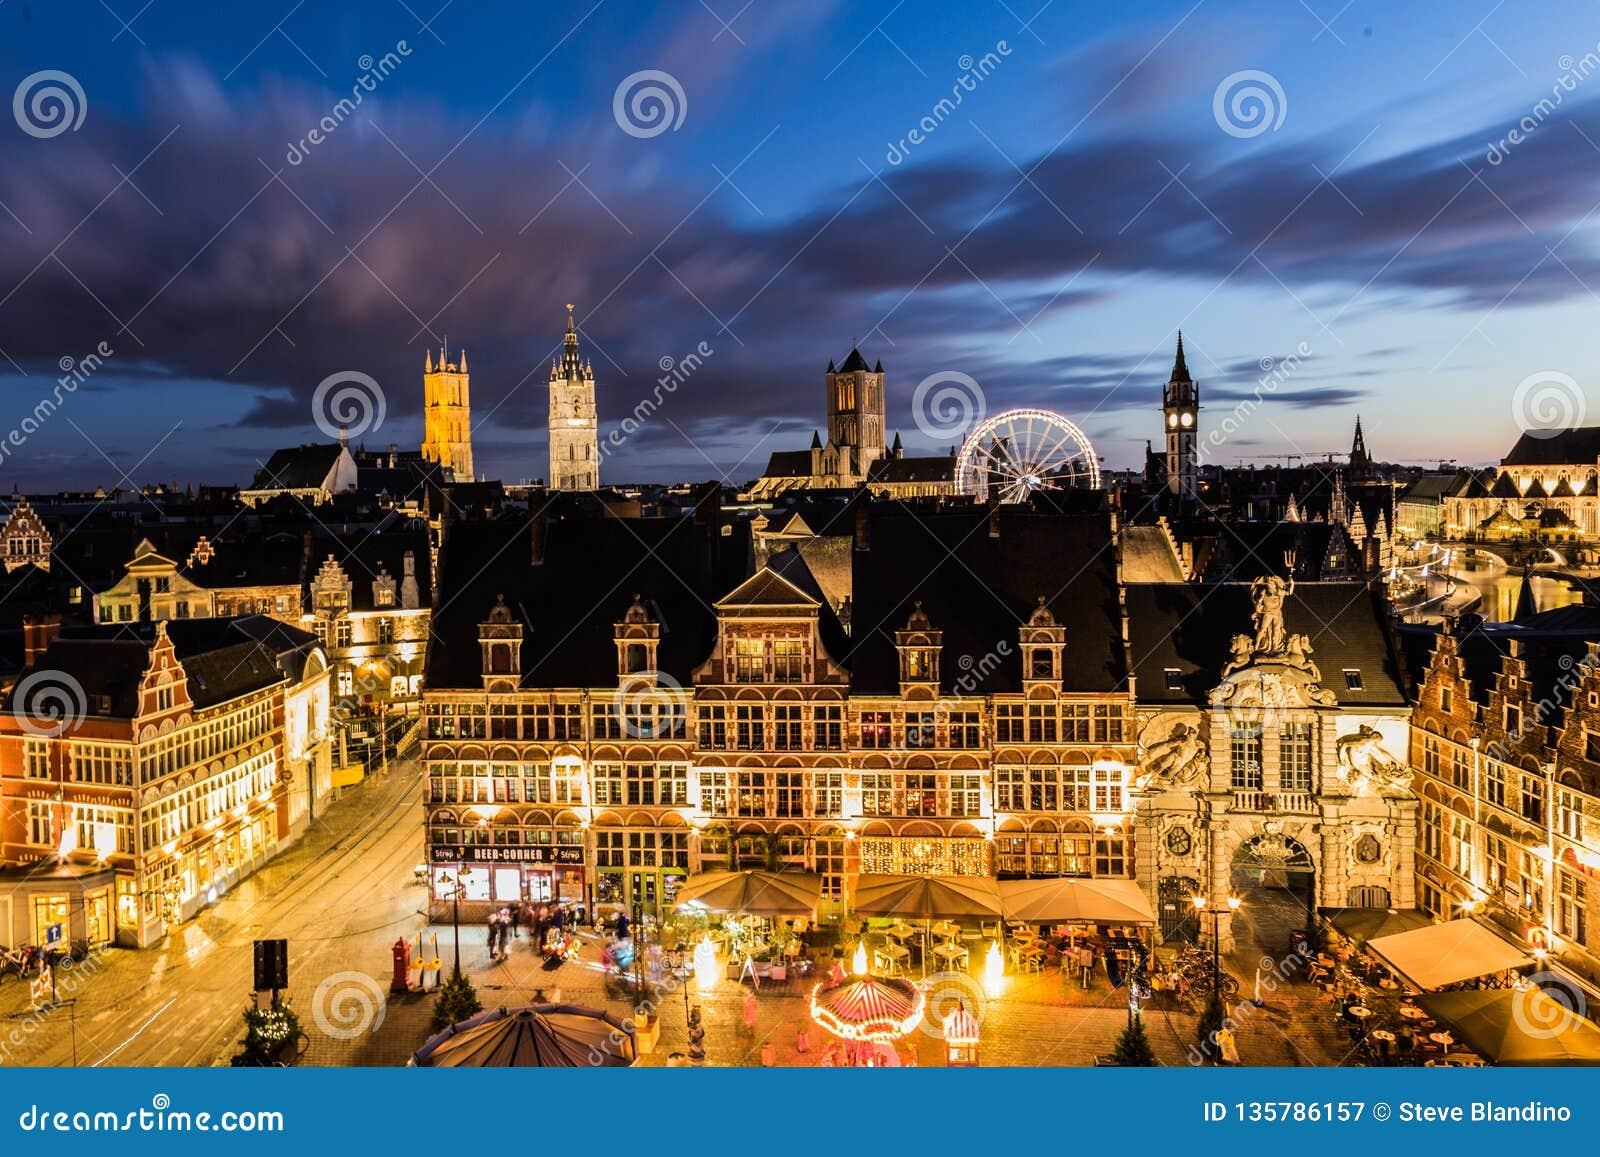 Winter in Ghent